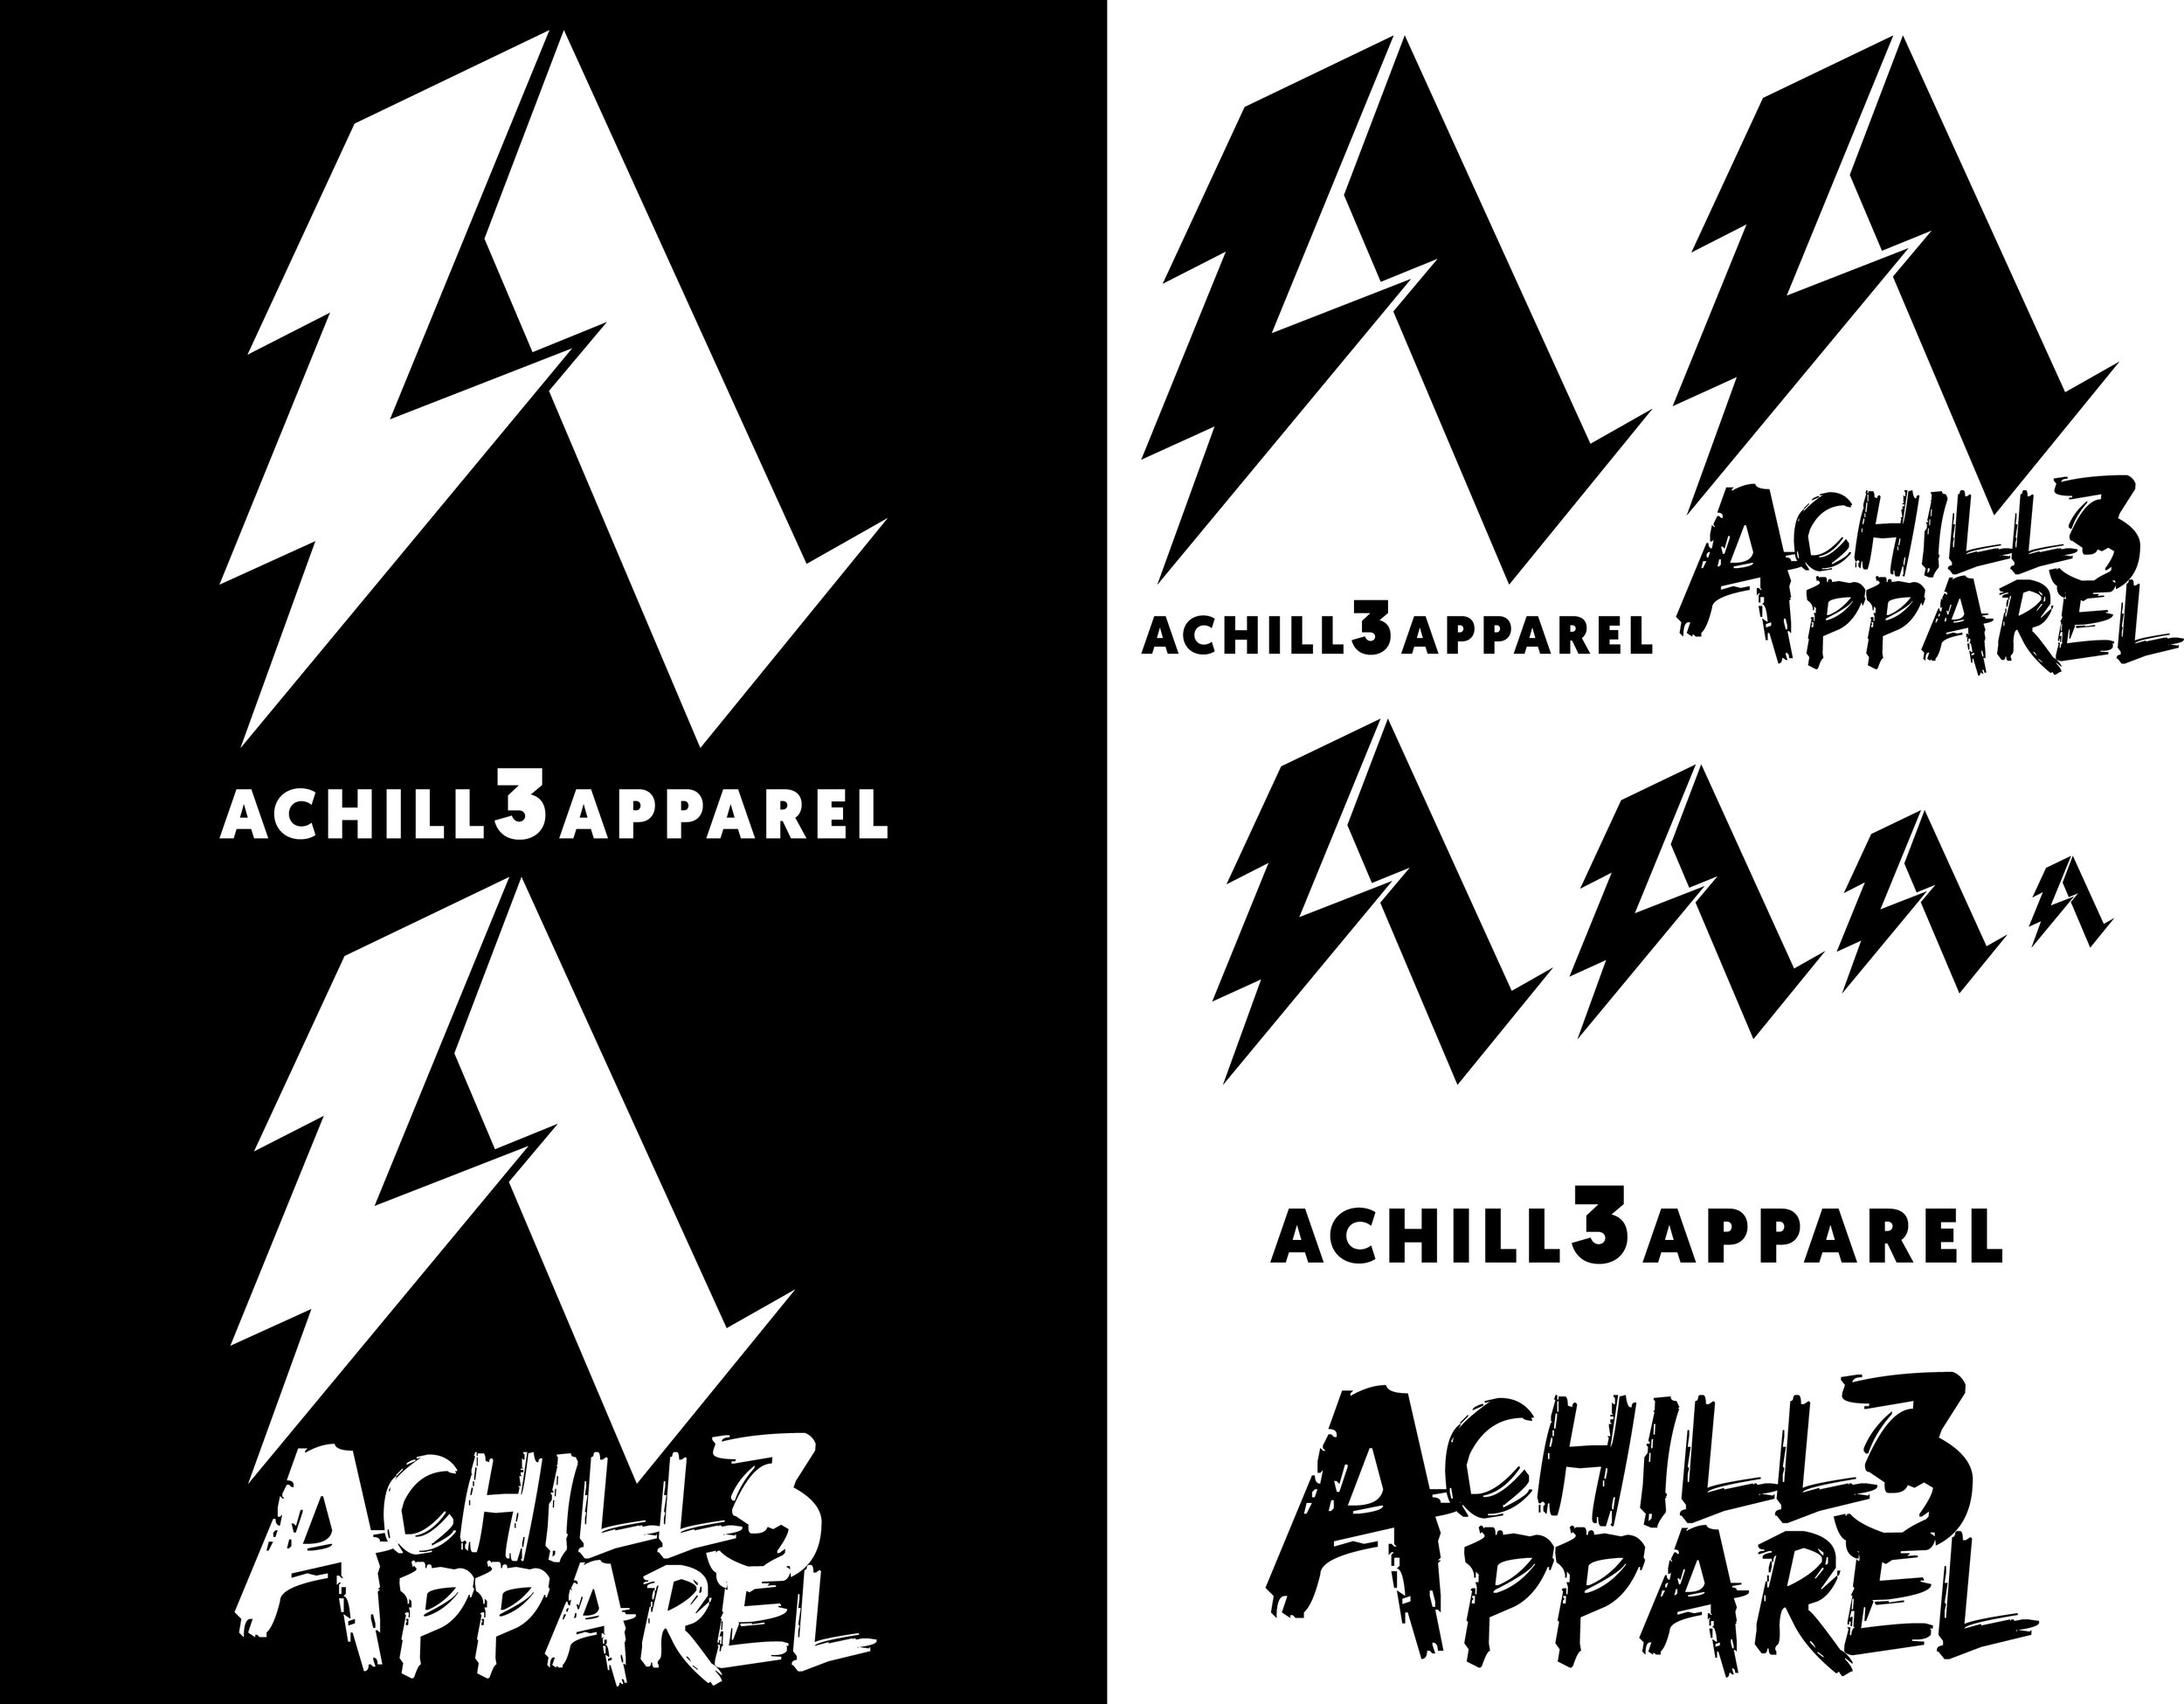 Achill3-Apparel-Main-Logo.jpg